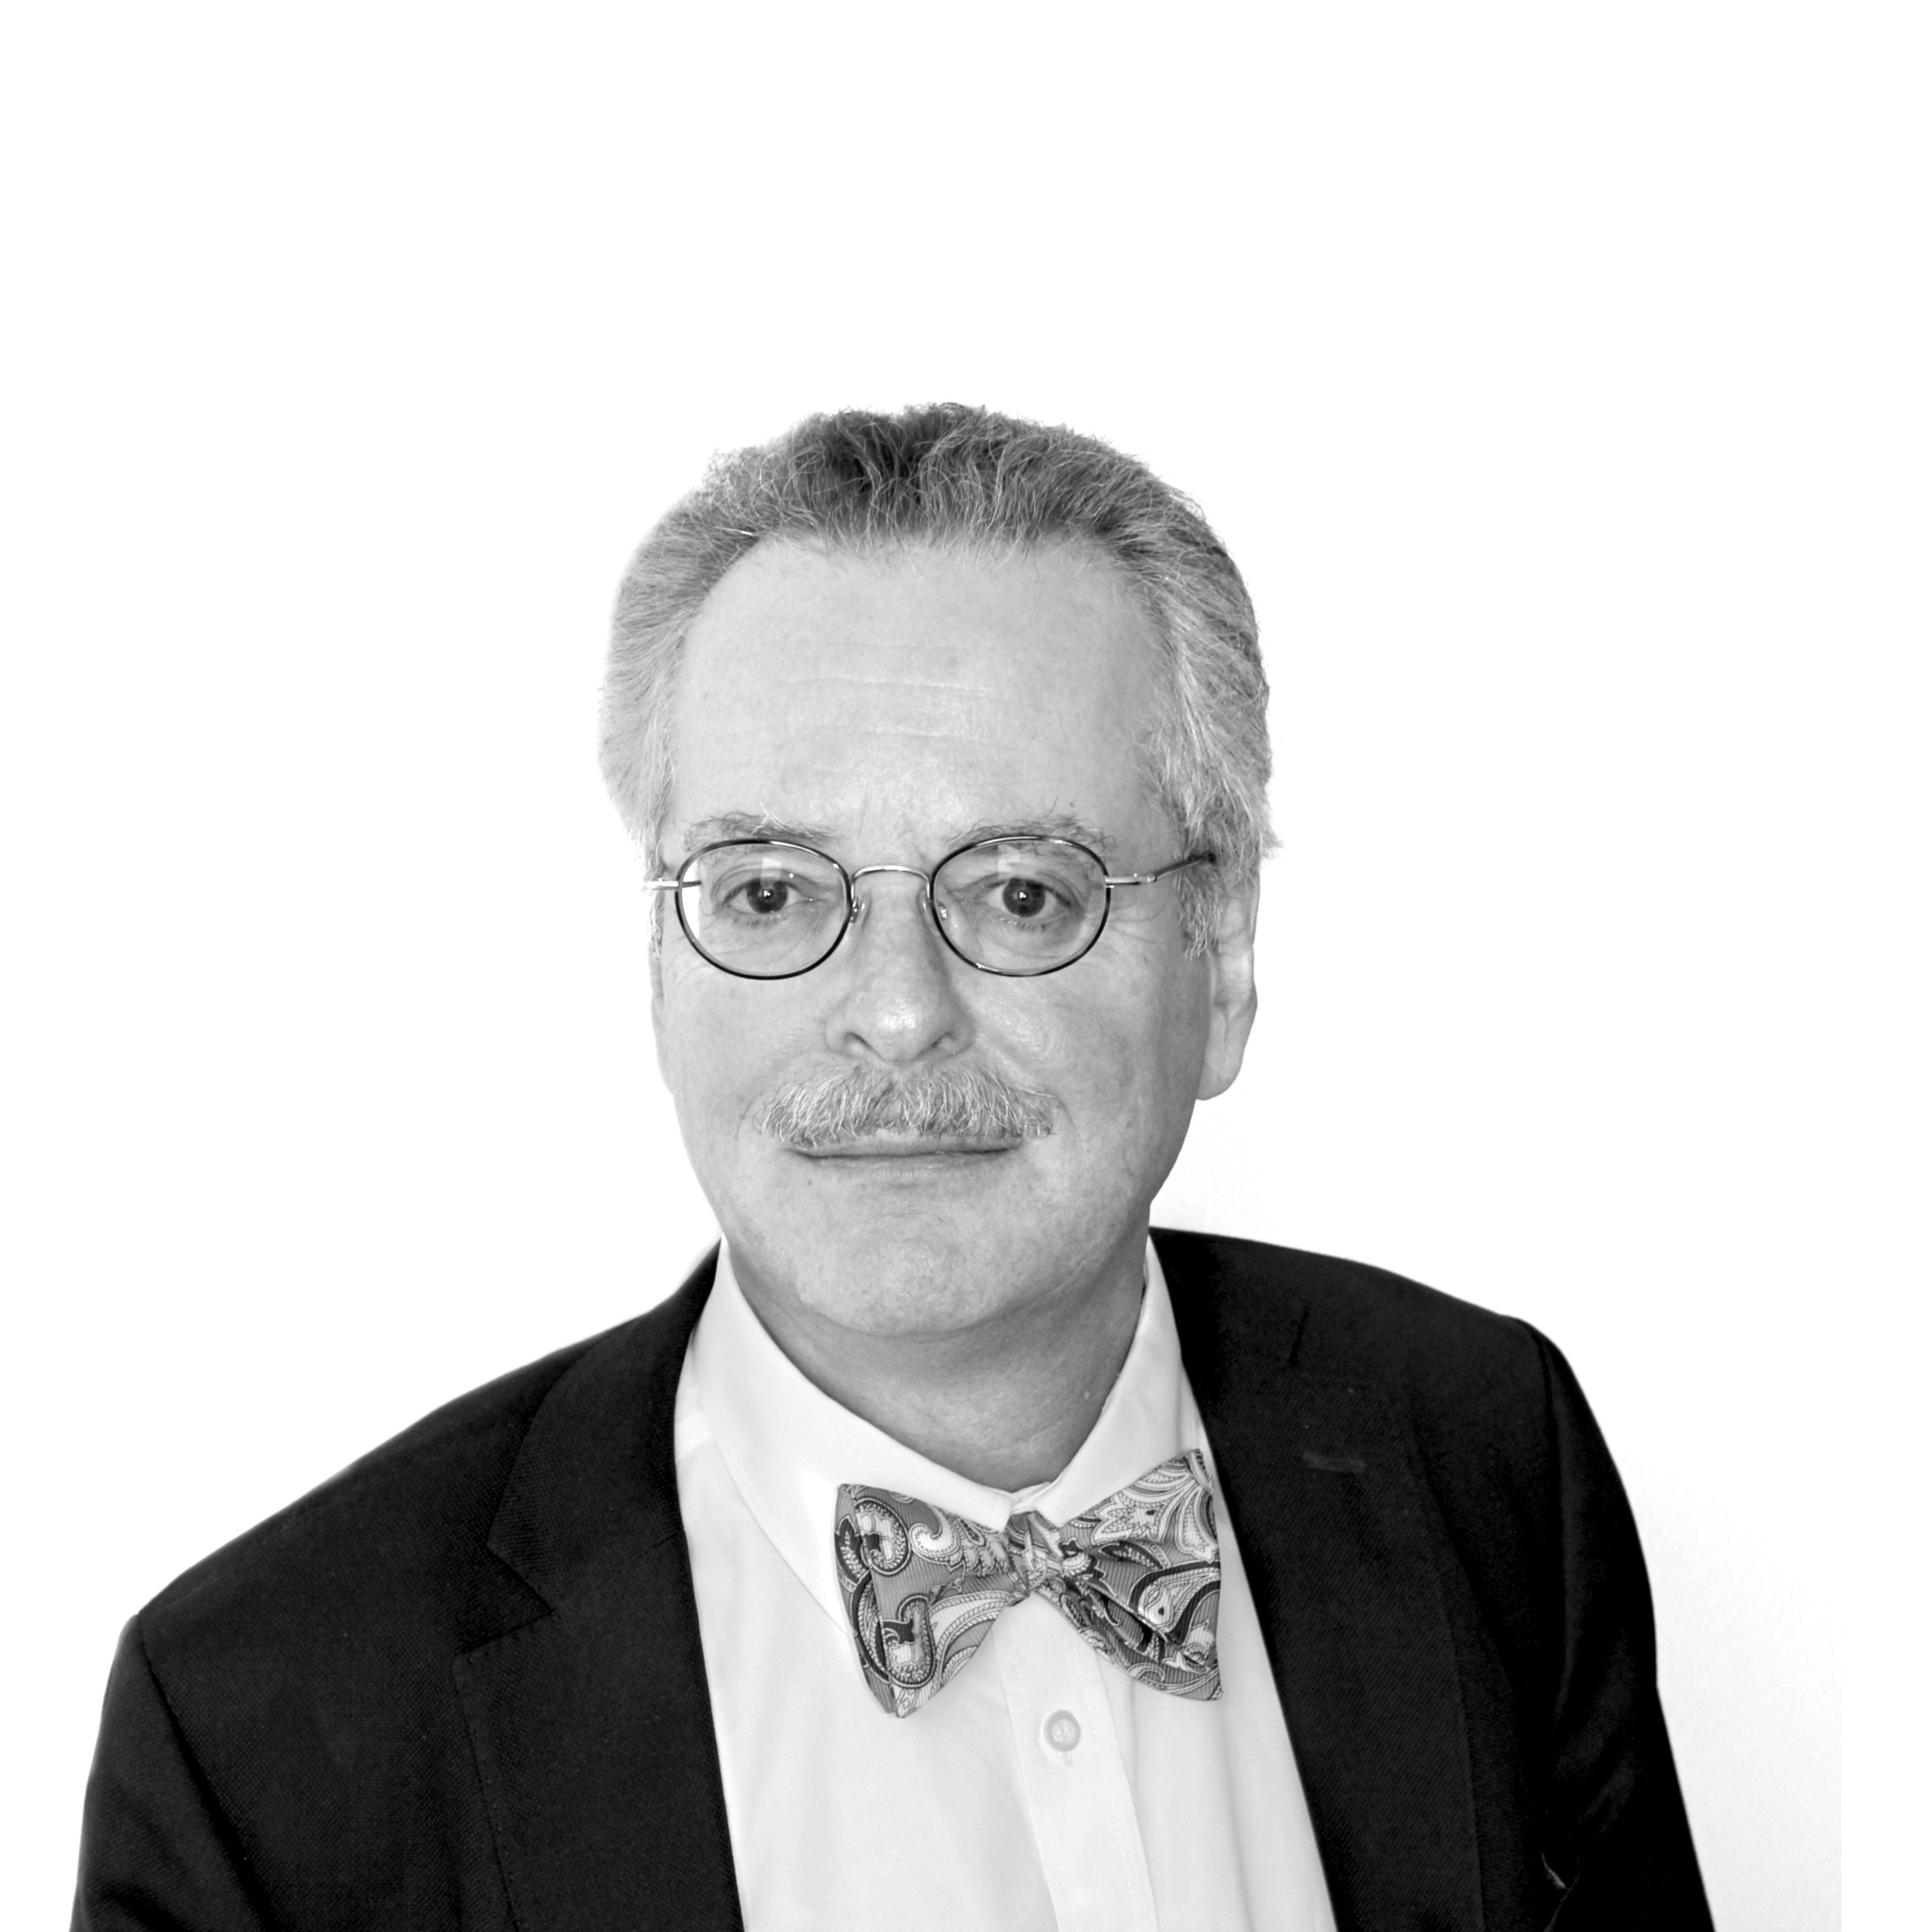 Markus E. Rentschler